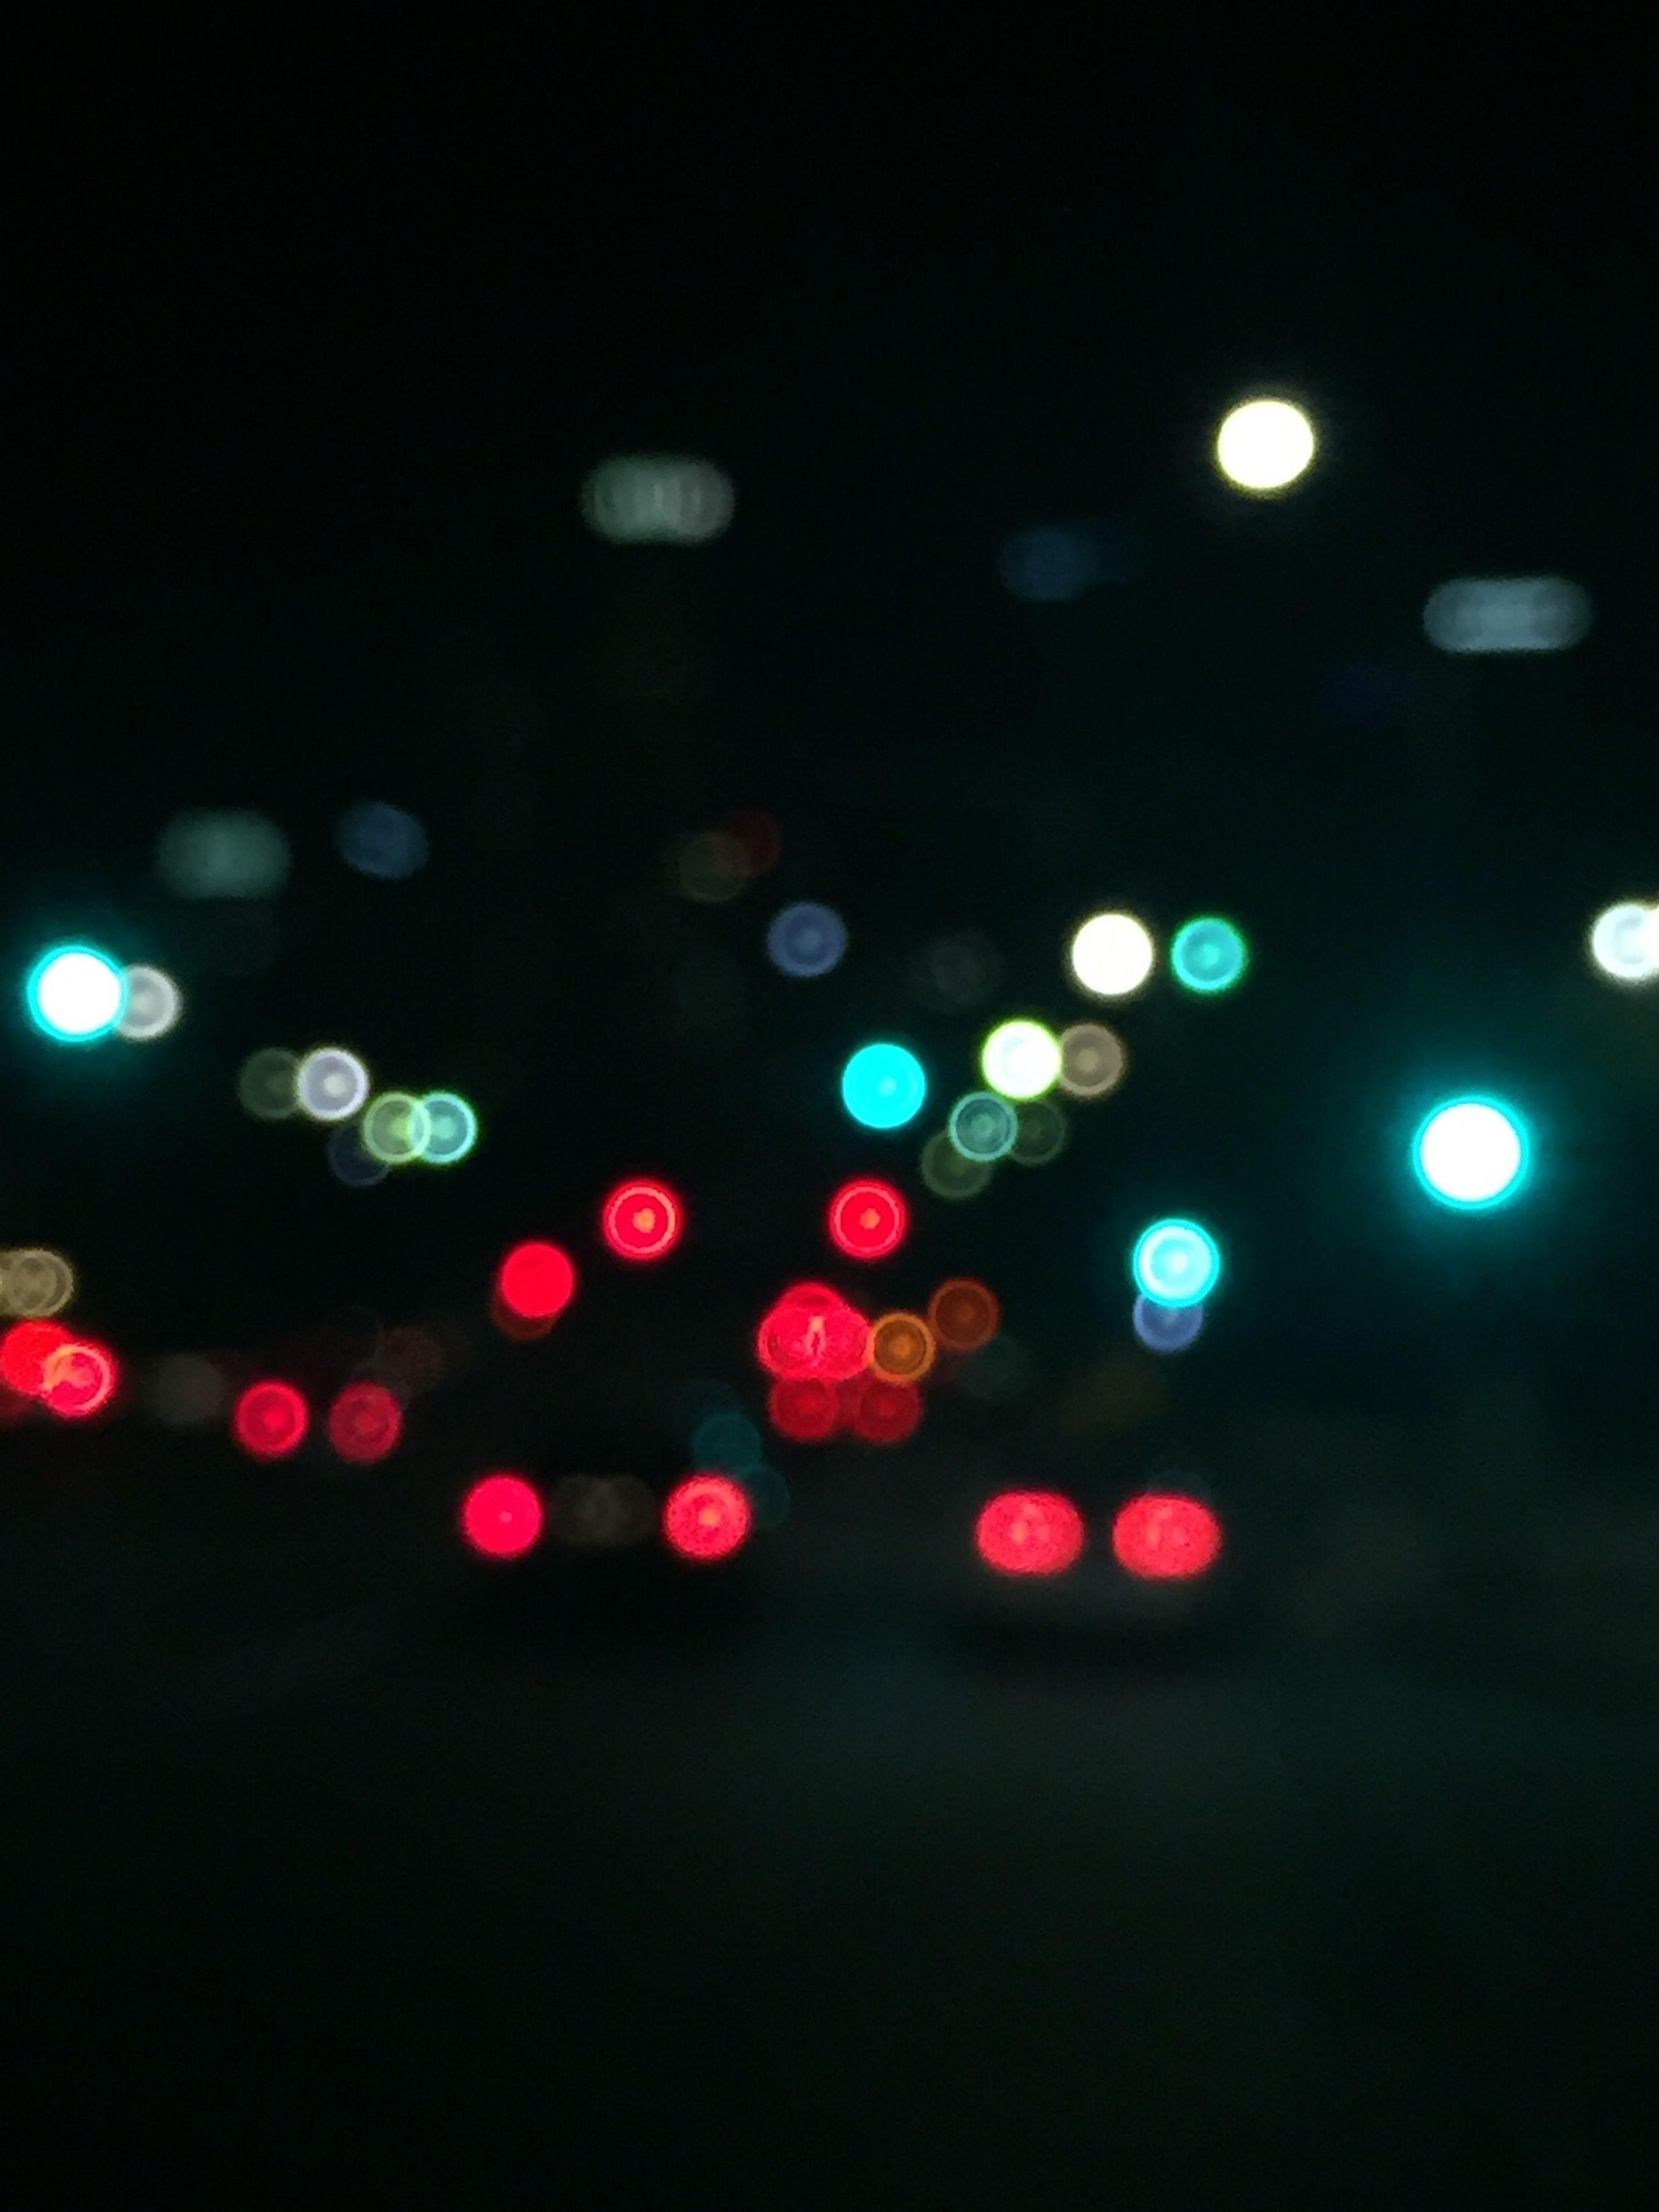 illuminated, night, defocused, lighting equipment, multi colored, light - natural phenomenon, circle, glowing, transportation, no people, street, indoors, red, abstract, road, dark, pattern, light, lens flare